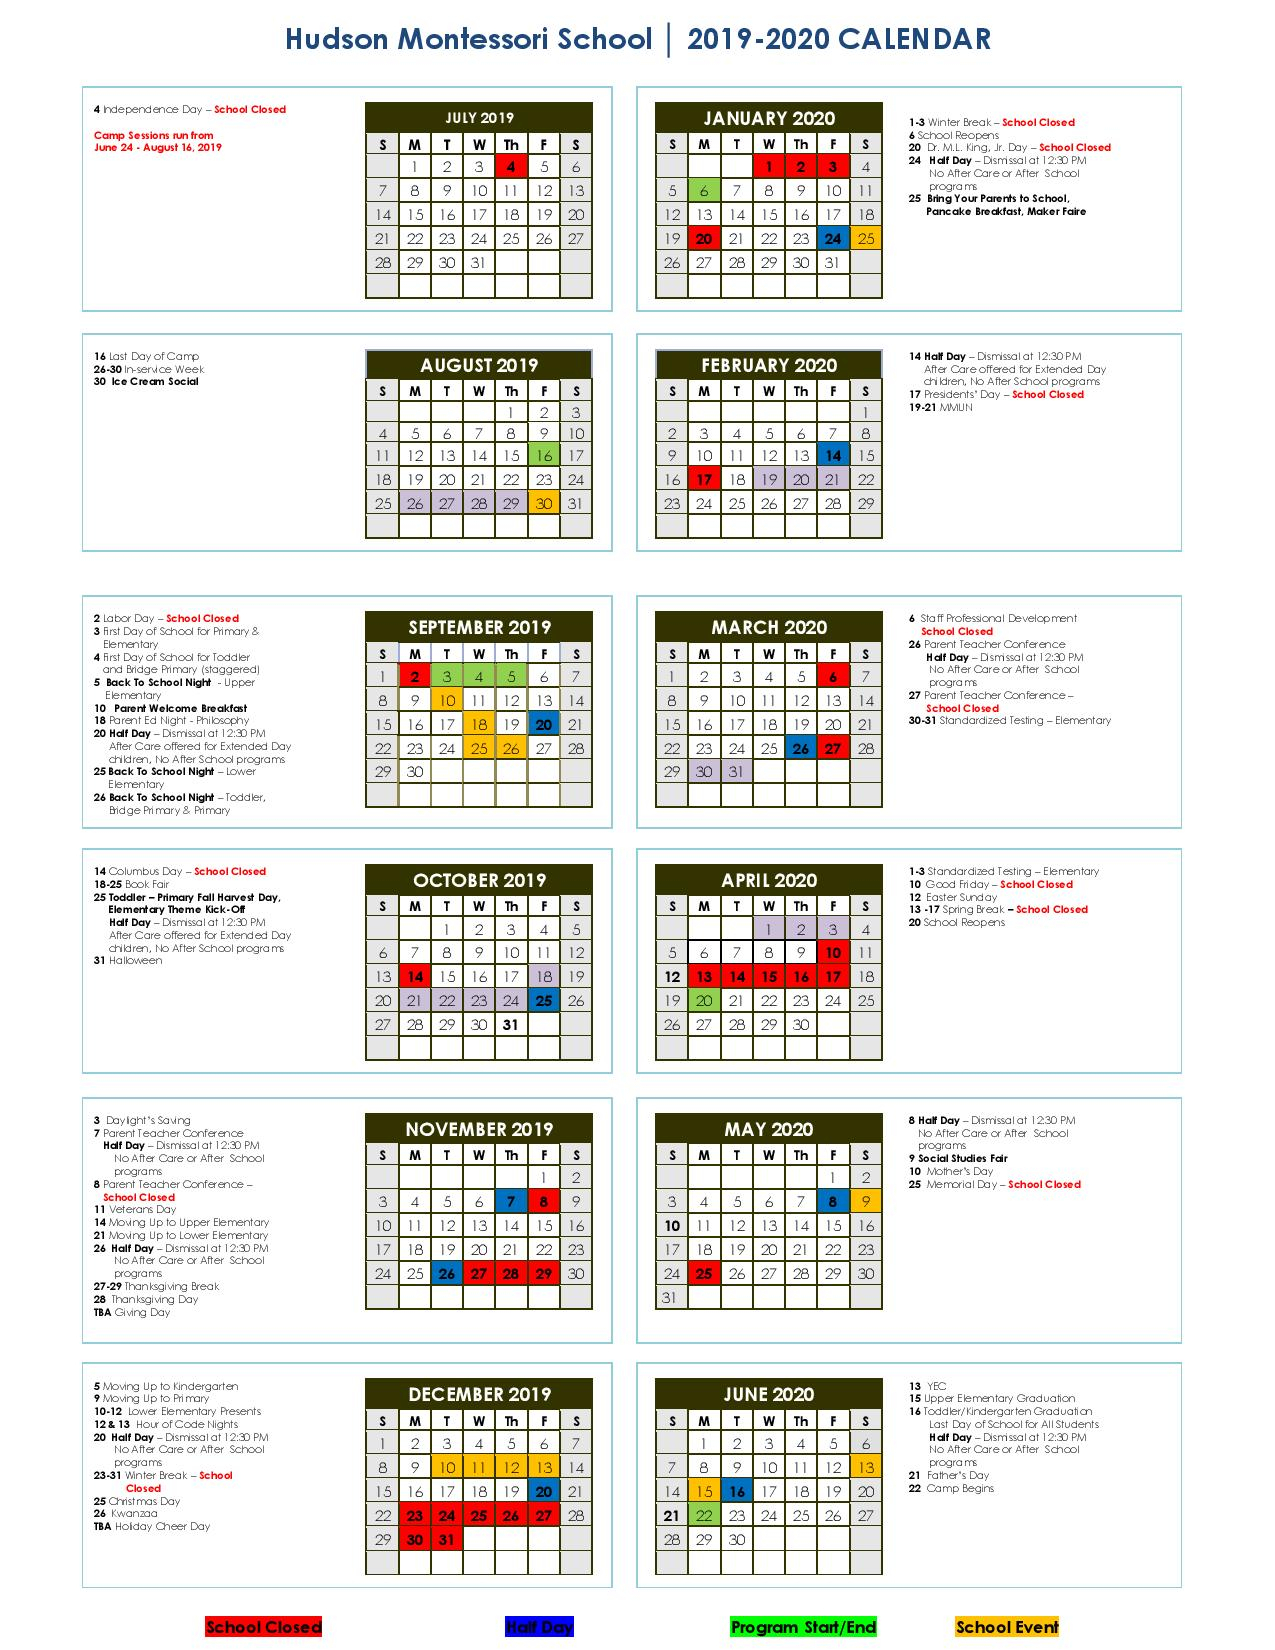 University Of Phoenix Holiday Calendar 2020 | Printable Within Academic Calendar Nassau Community College 2021 2020